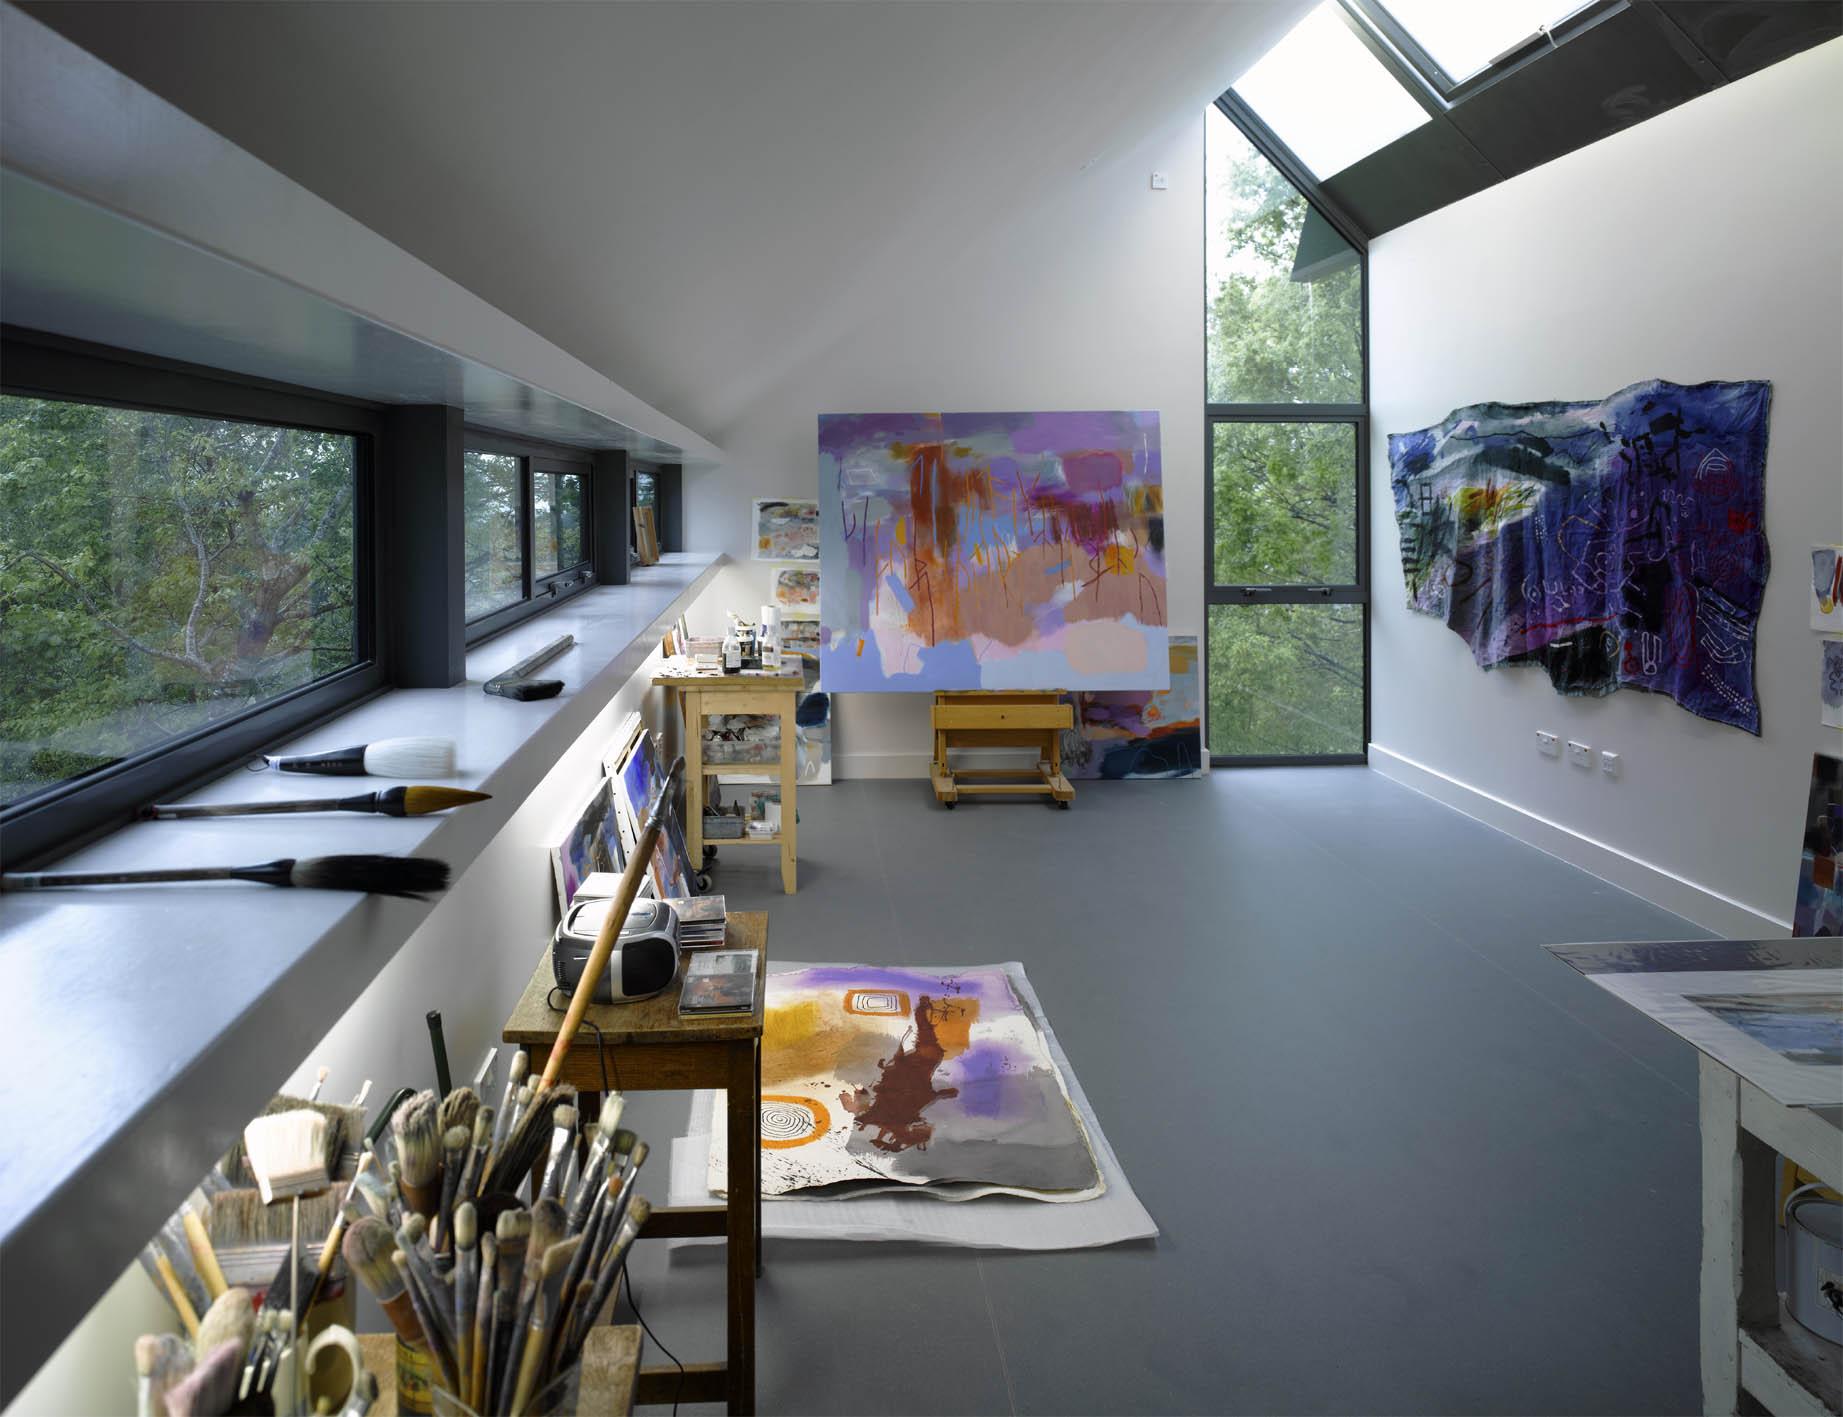 Aberystwyth Creative Units - Interior 1 (c) Edmund Sumner